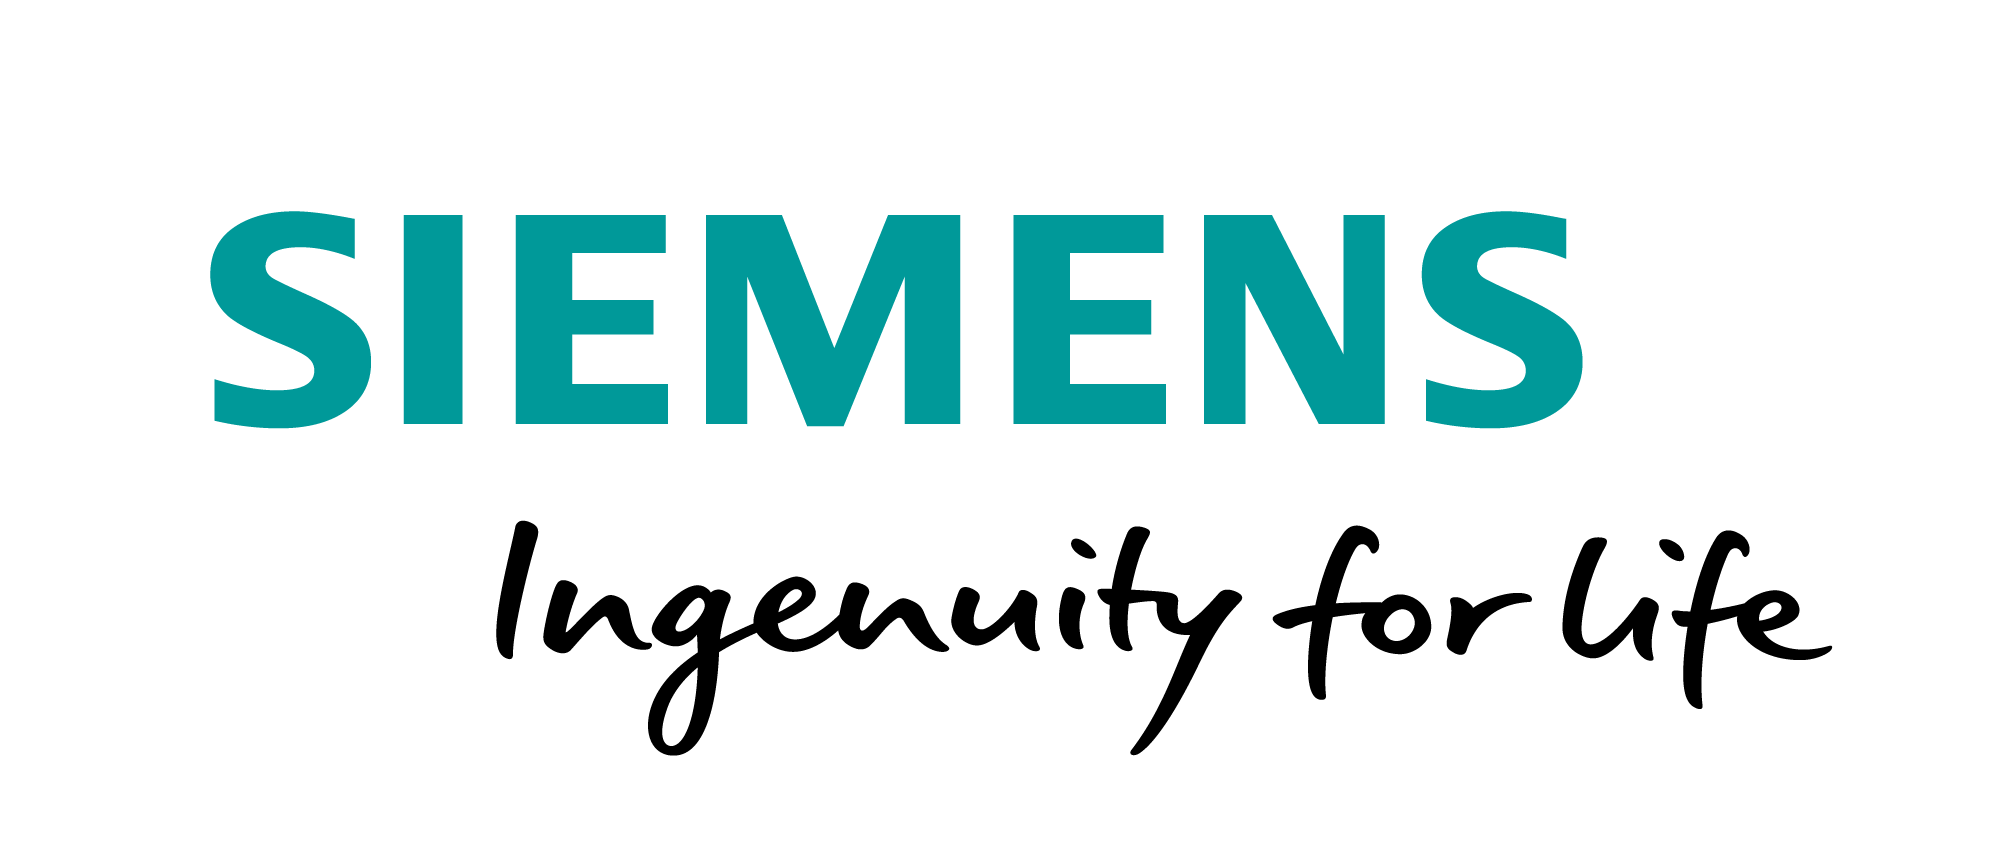 Siemens Smart Infrastructure Company Logo